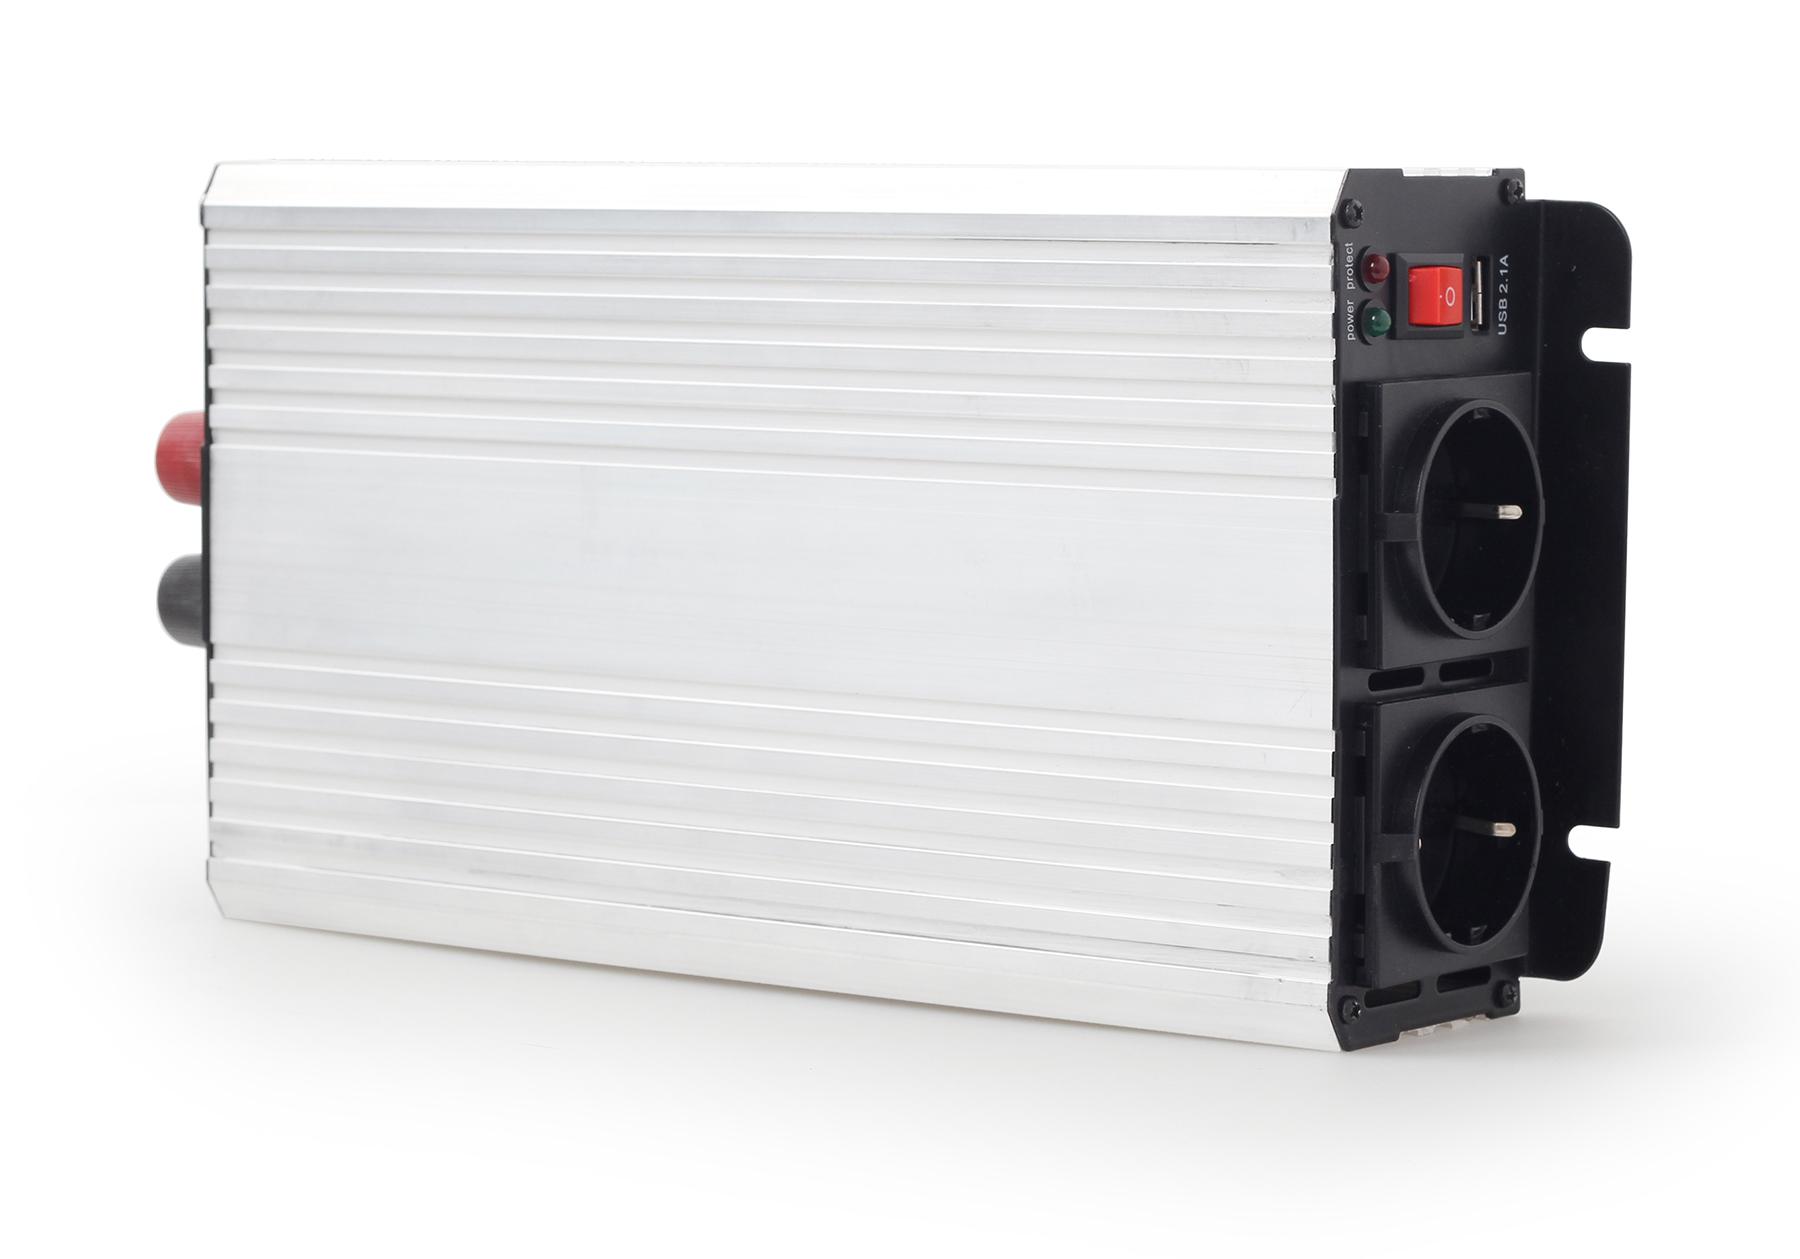 Автомобильный инвертор 12V/220V 800 ВТ ENERGENIE (EG-PWC-044) Energenie - фото 5